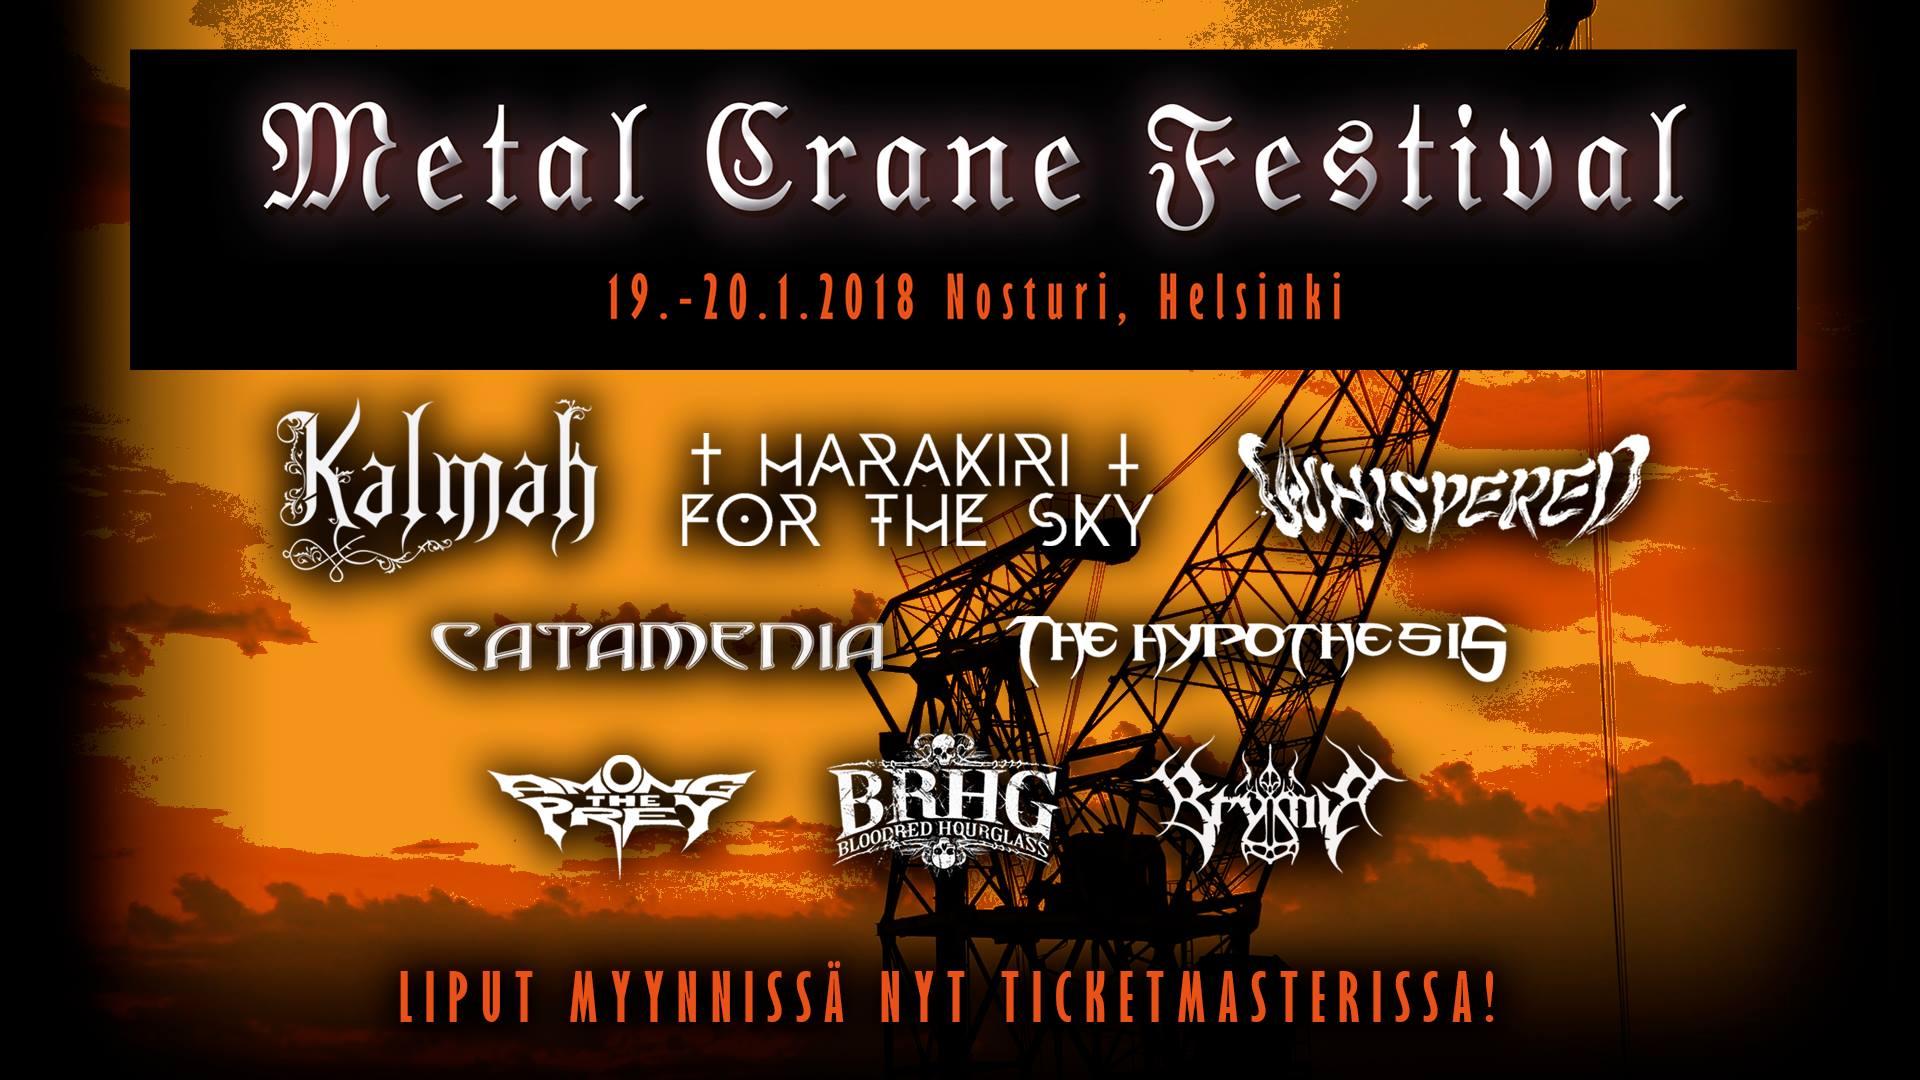 Metal Crane Festival report